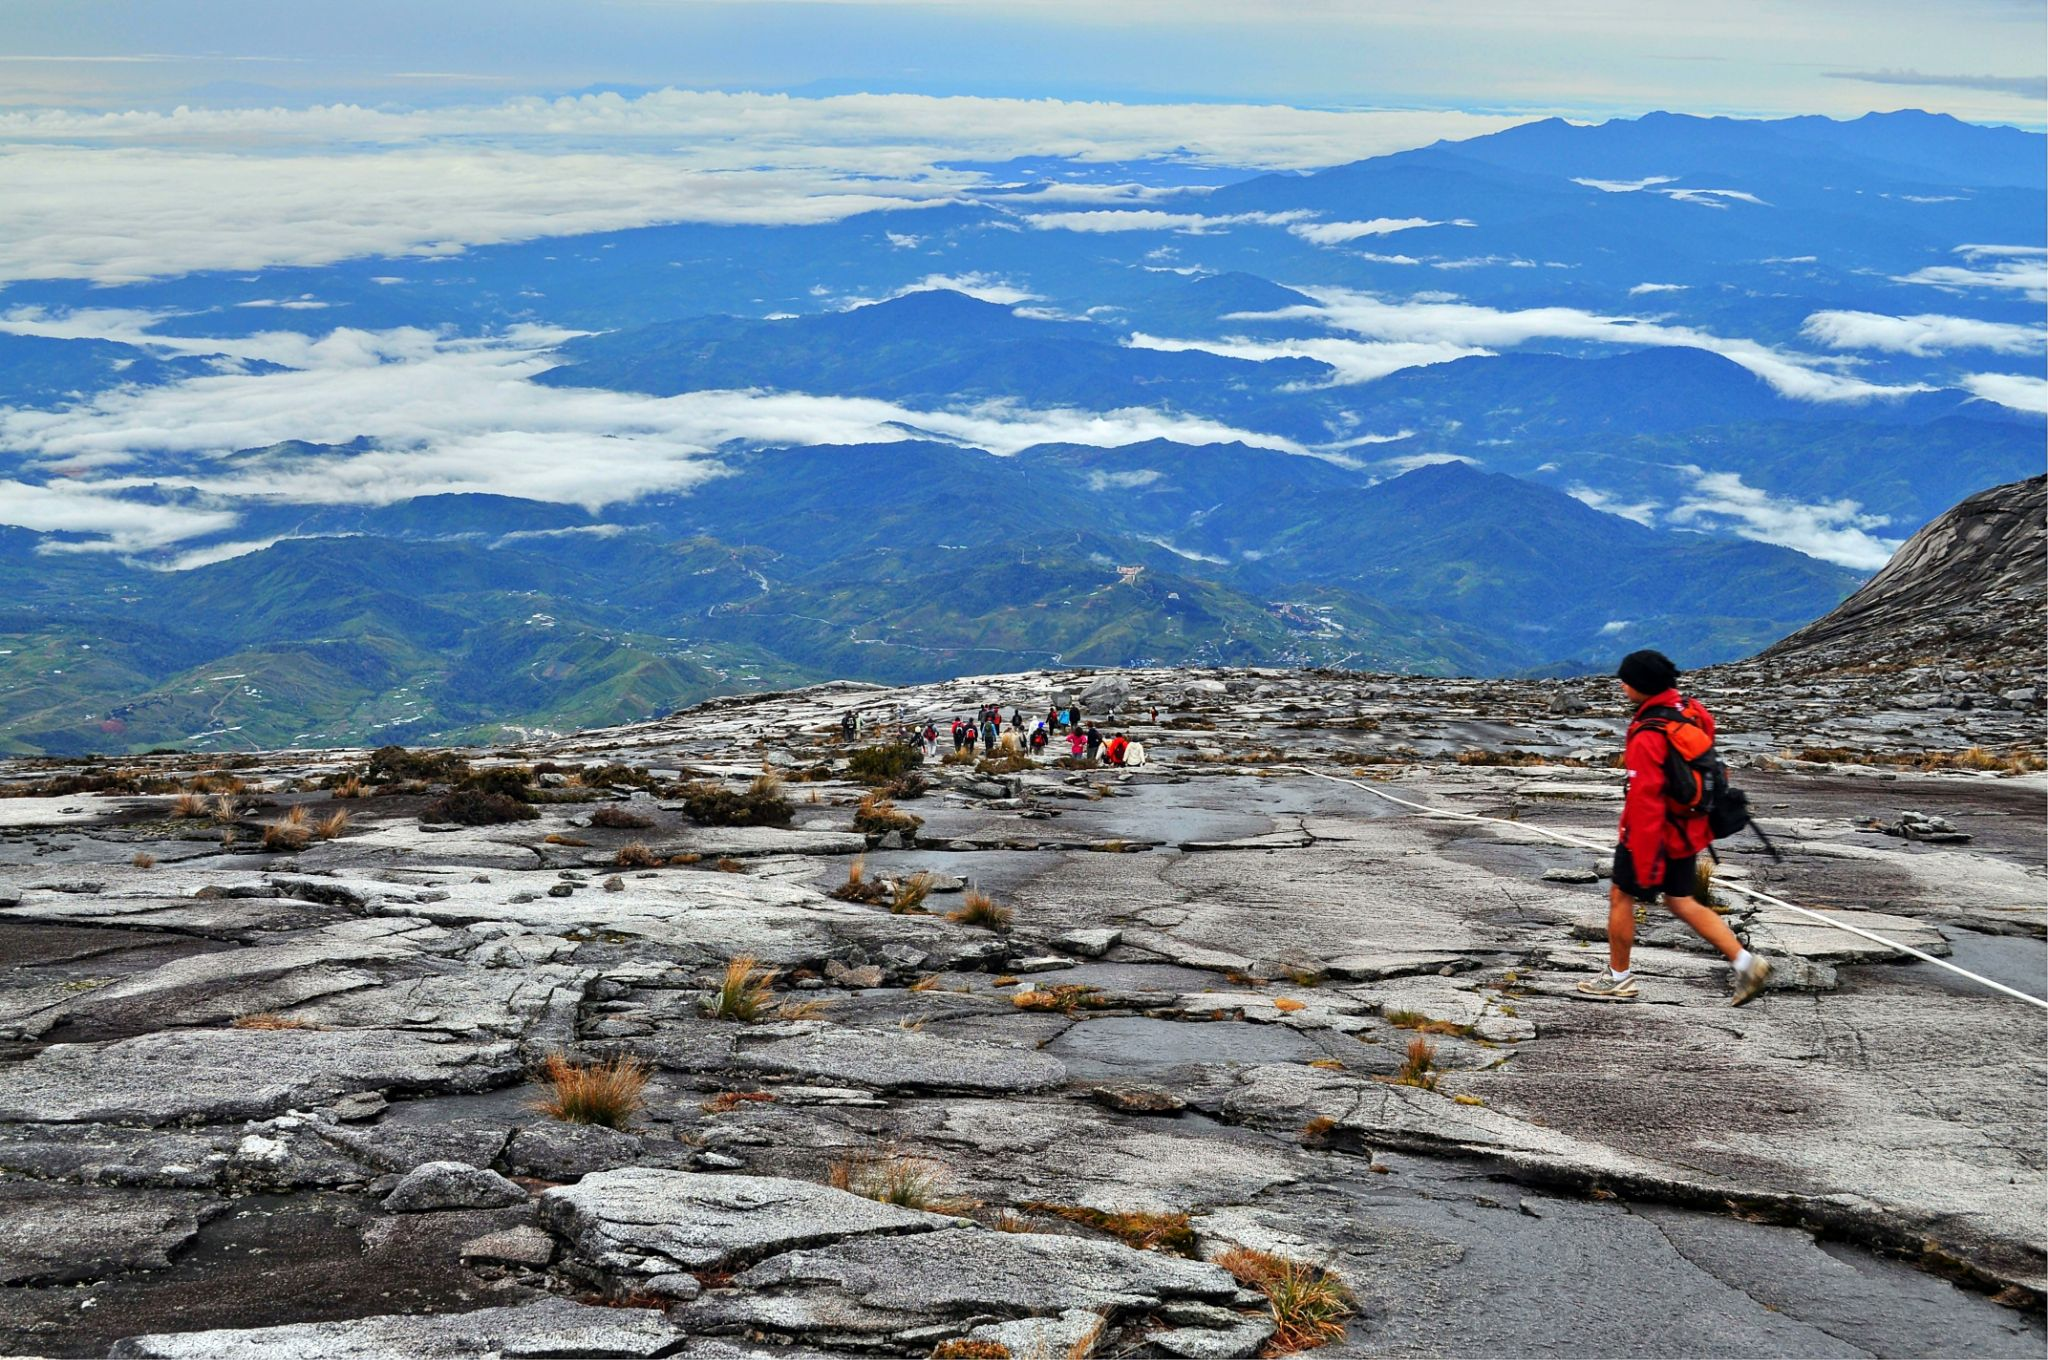 Mount Kinabalu, Sabah by Lenny7